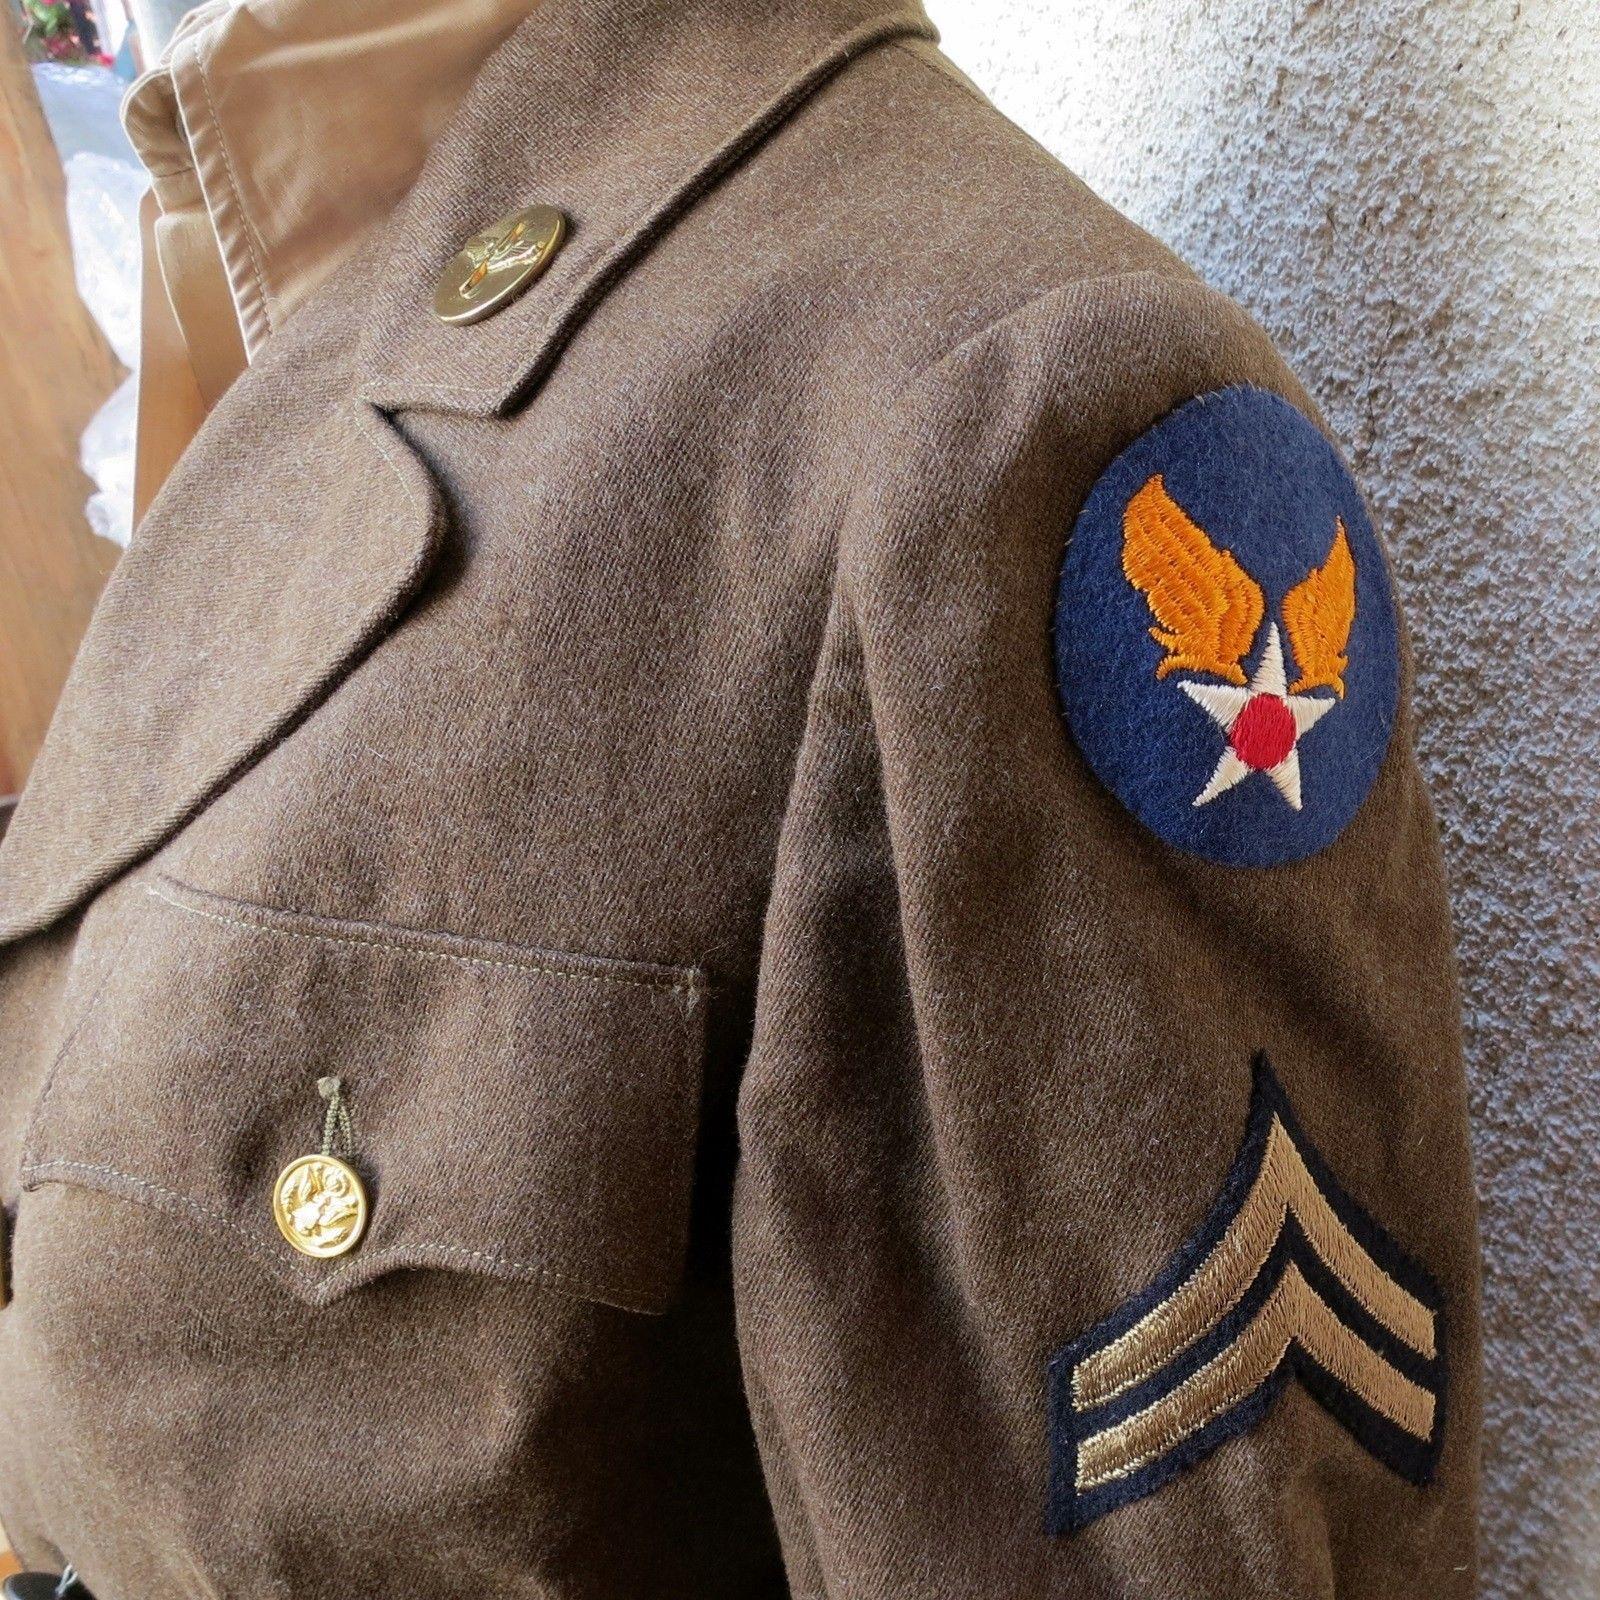 WAAC WAC WWII Women's Uniform: A Way to Help Preserve